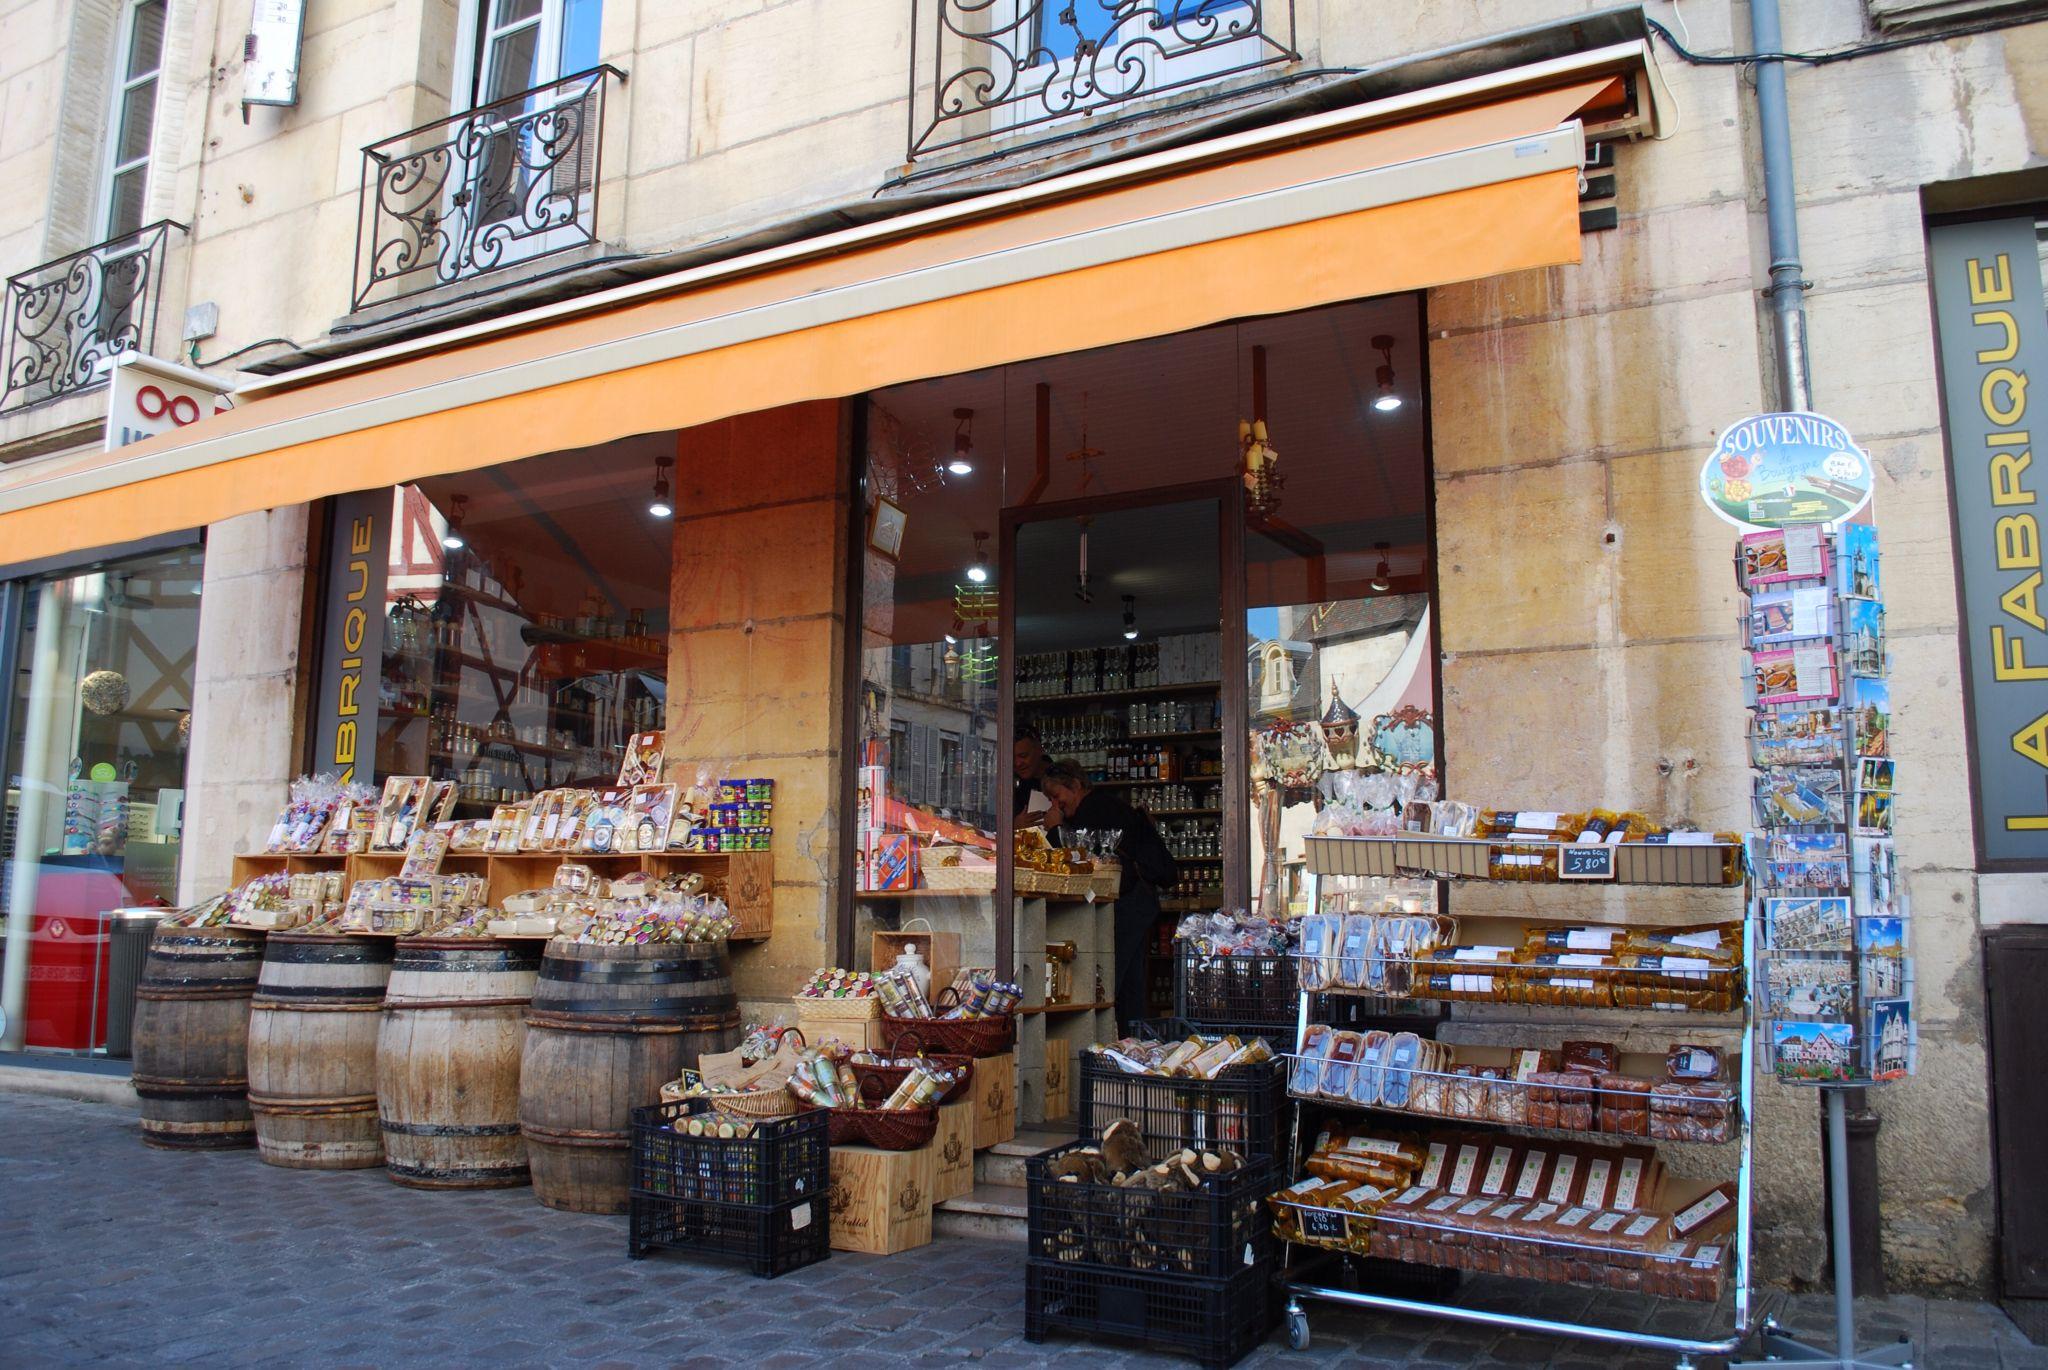 One of many mustard shops in Dijon